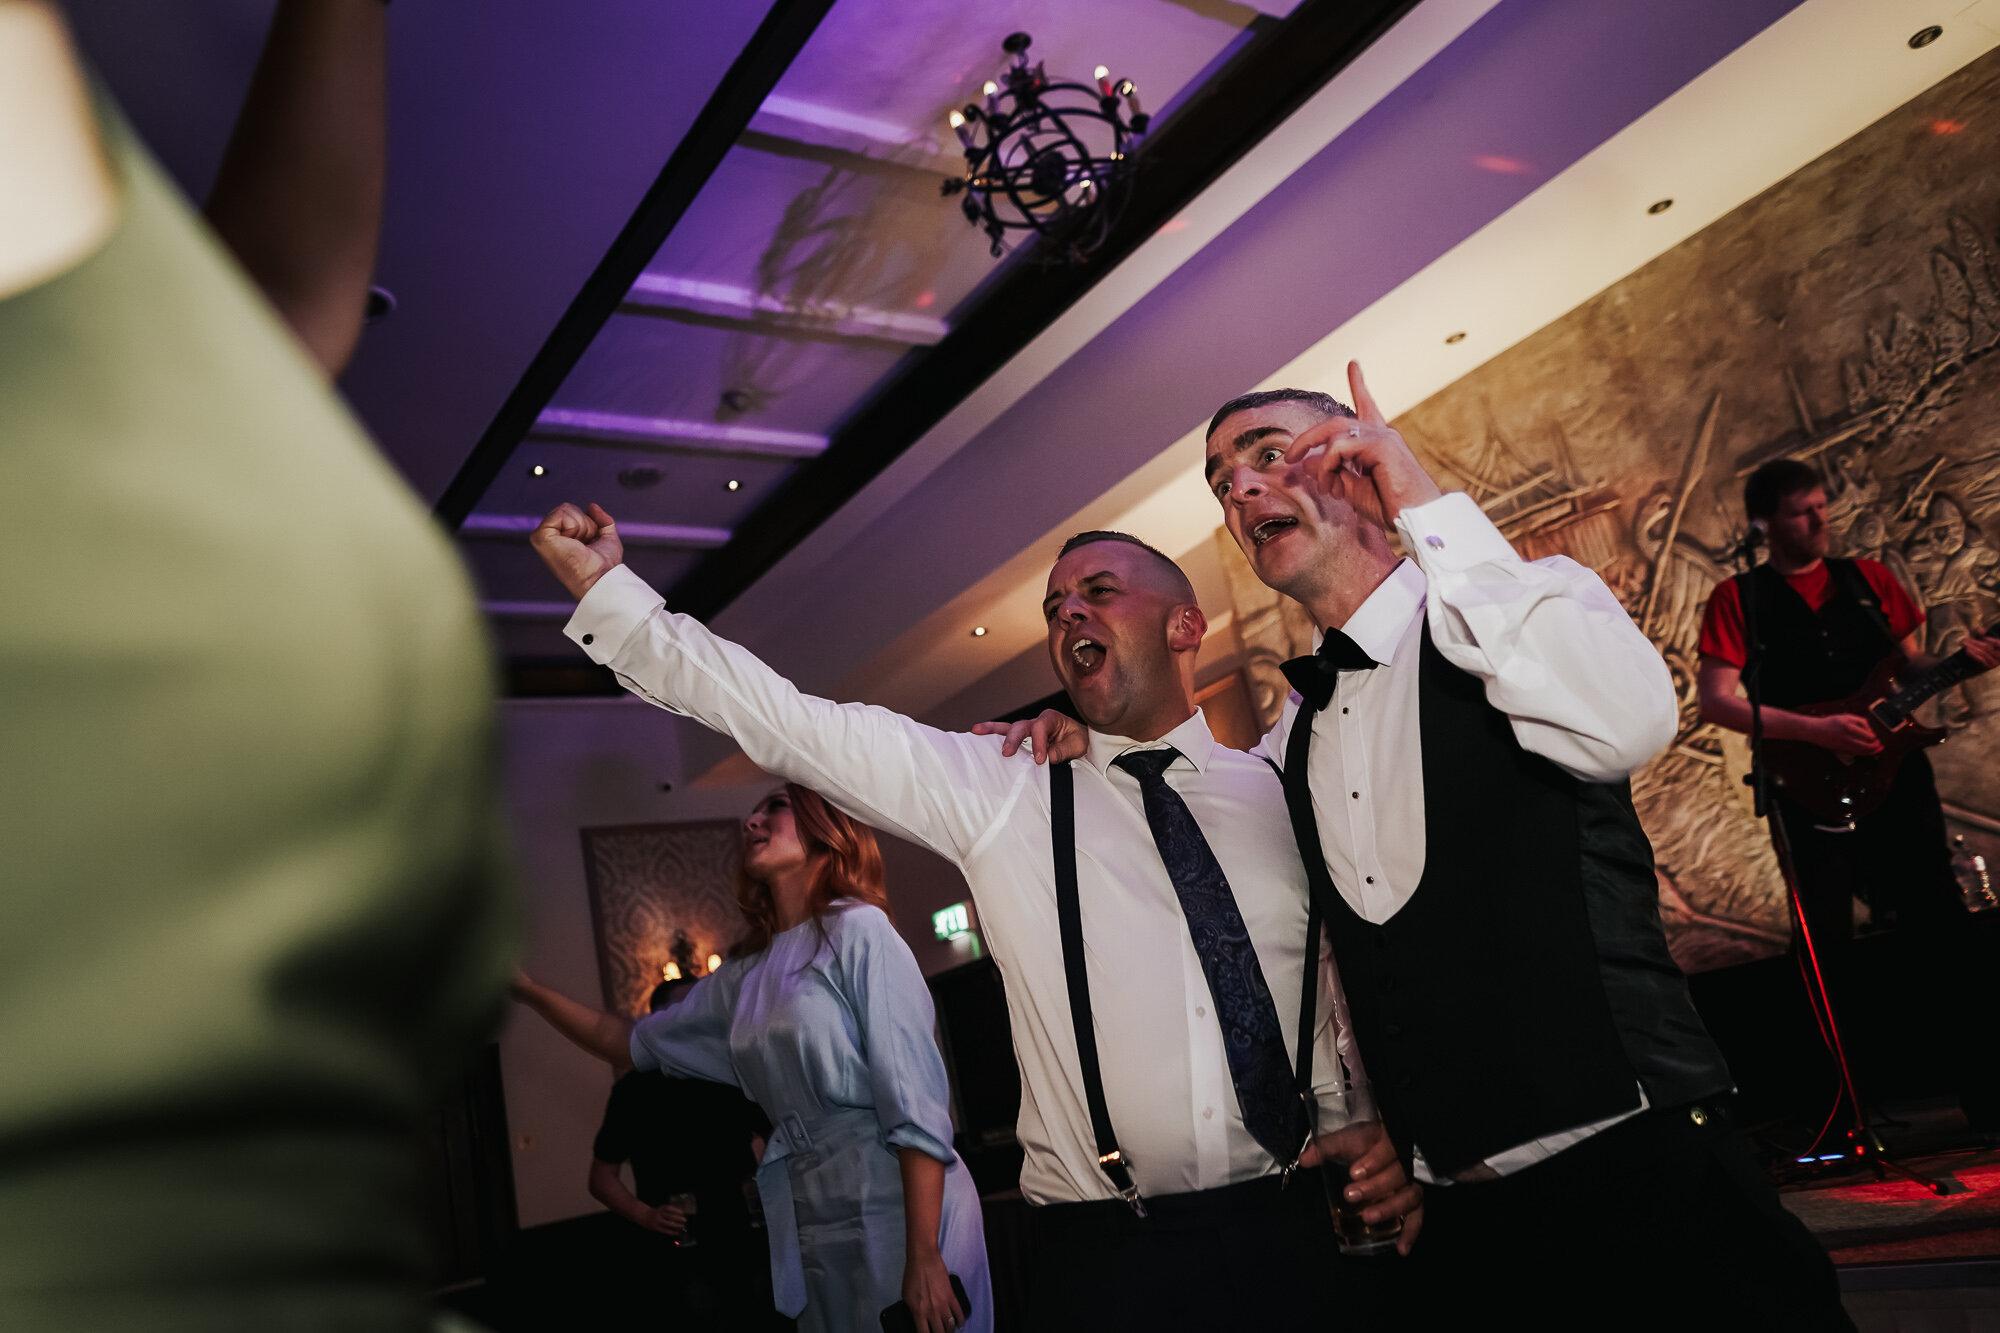 Clontarf Caste wedding photographer Wedding Photography dublin ireland wedding photographer (57 of 58).jpg